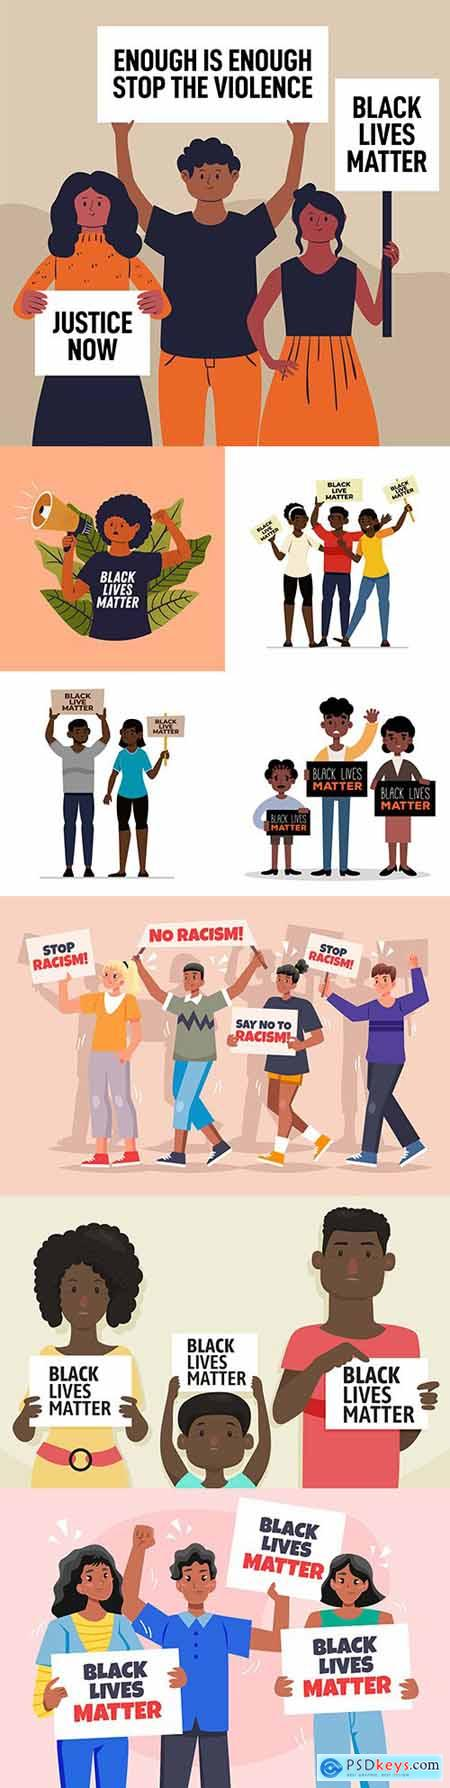 Black life protest against racism matters concept